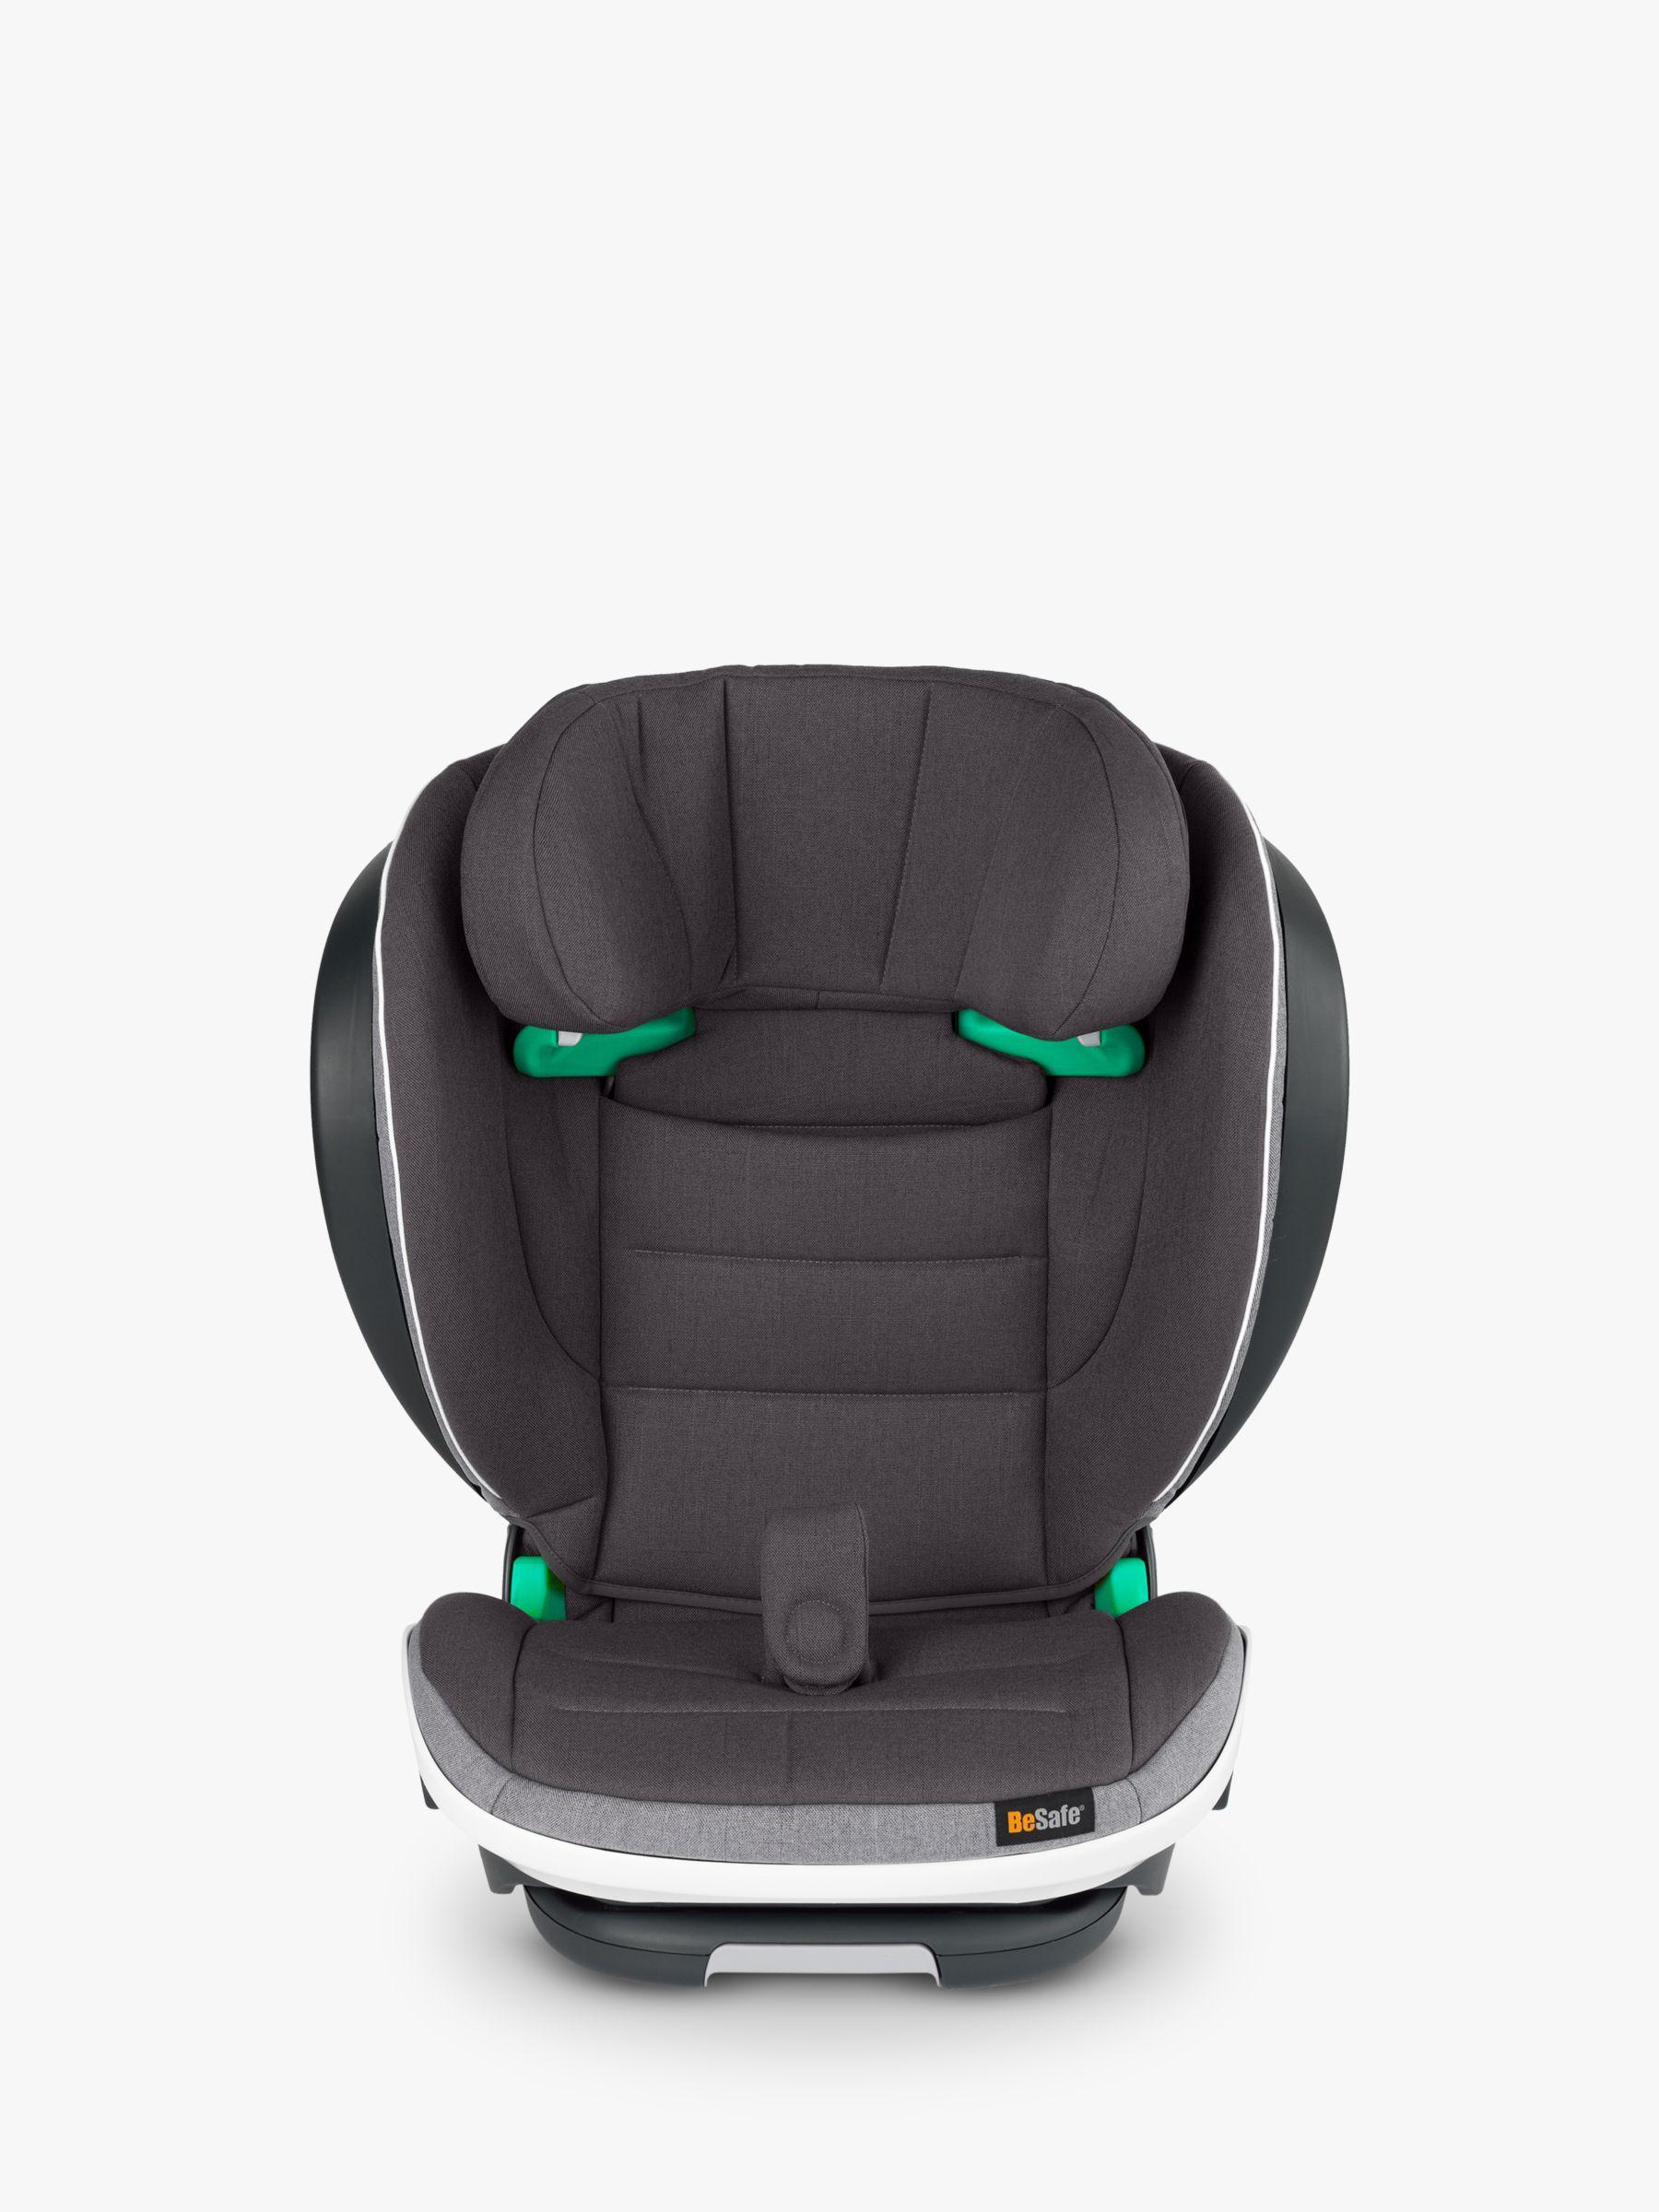 BeSafe BeSafe iZi Flex FIX i-Size High-Back Booster Group 2/3 Car Seat, Metallic Melange